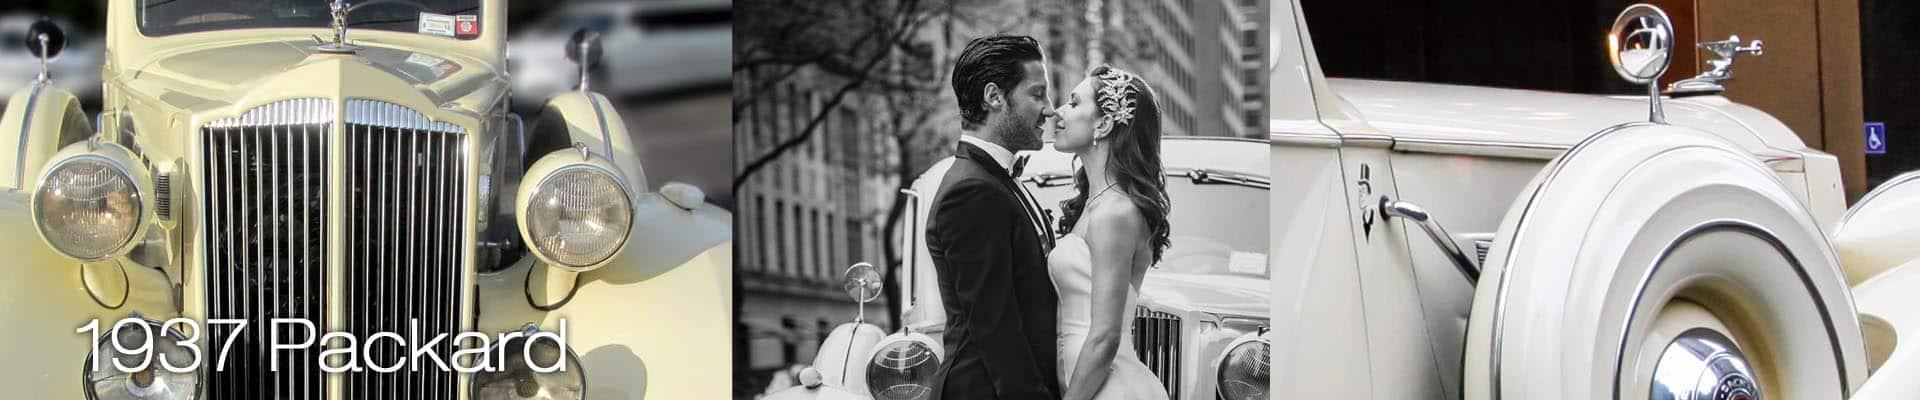 Long Island Wedding Limos